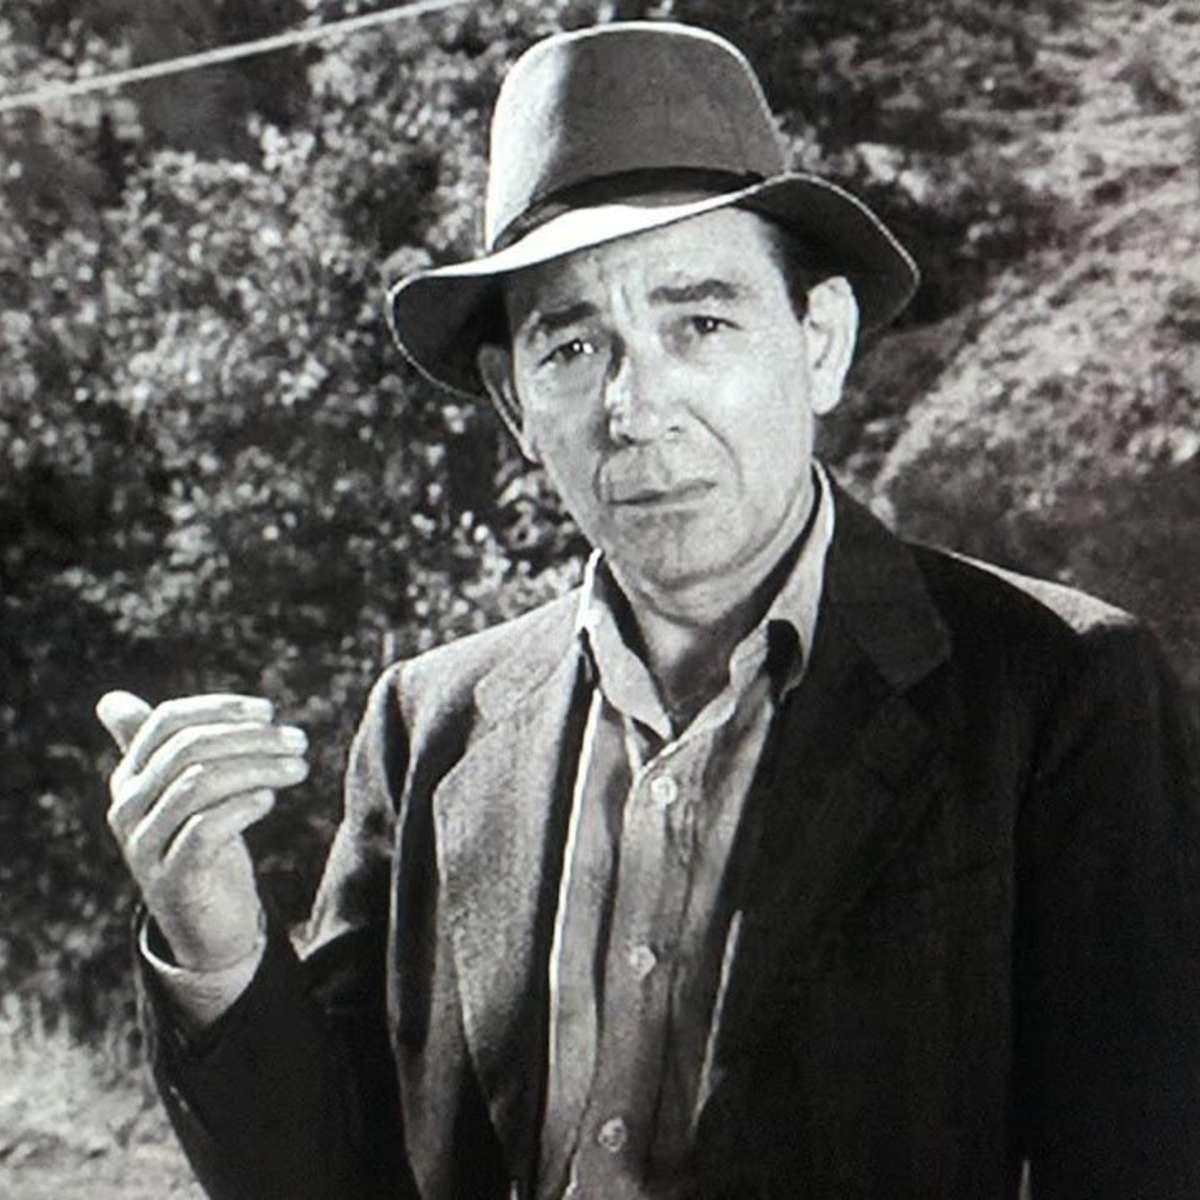 Twilight Zone The Hitch-Hiker hero 01